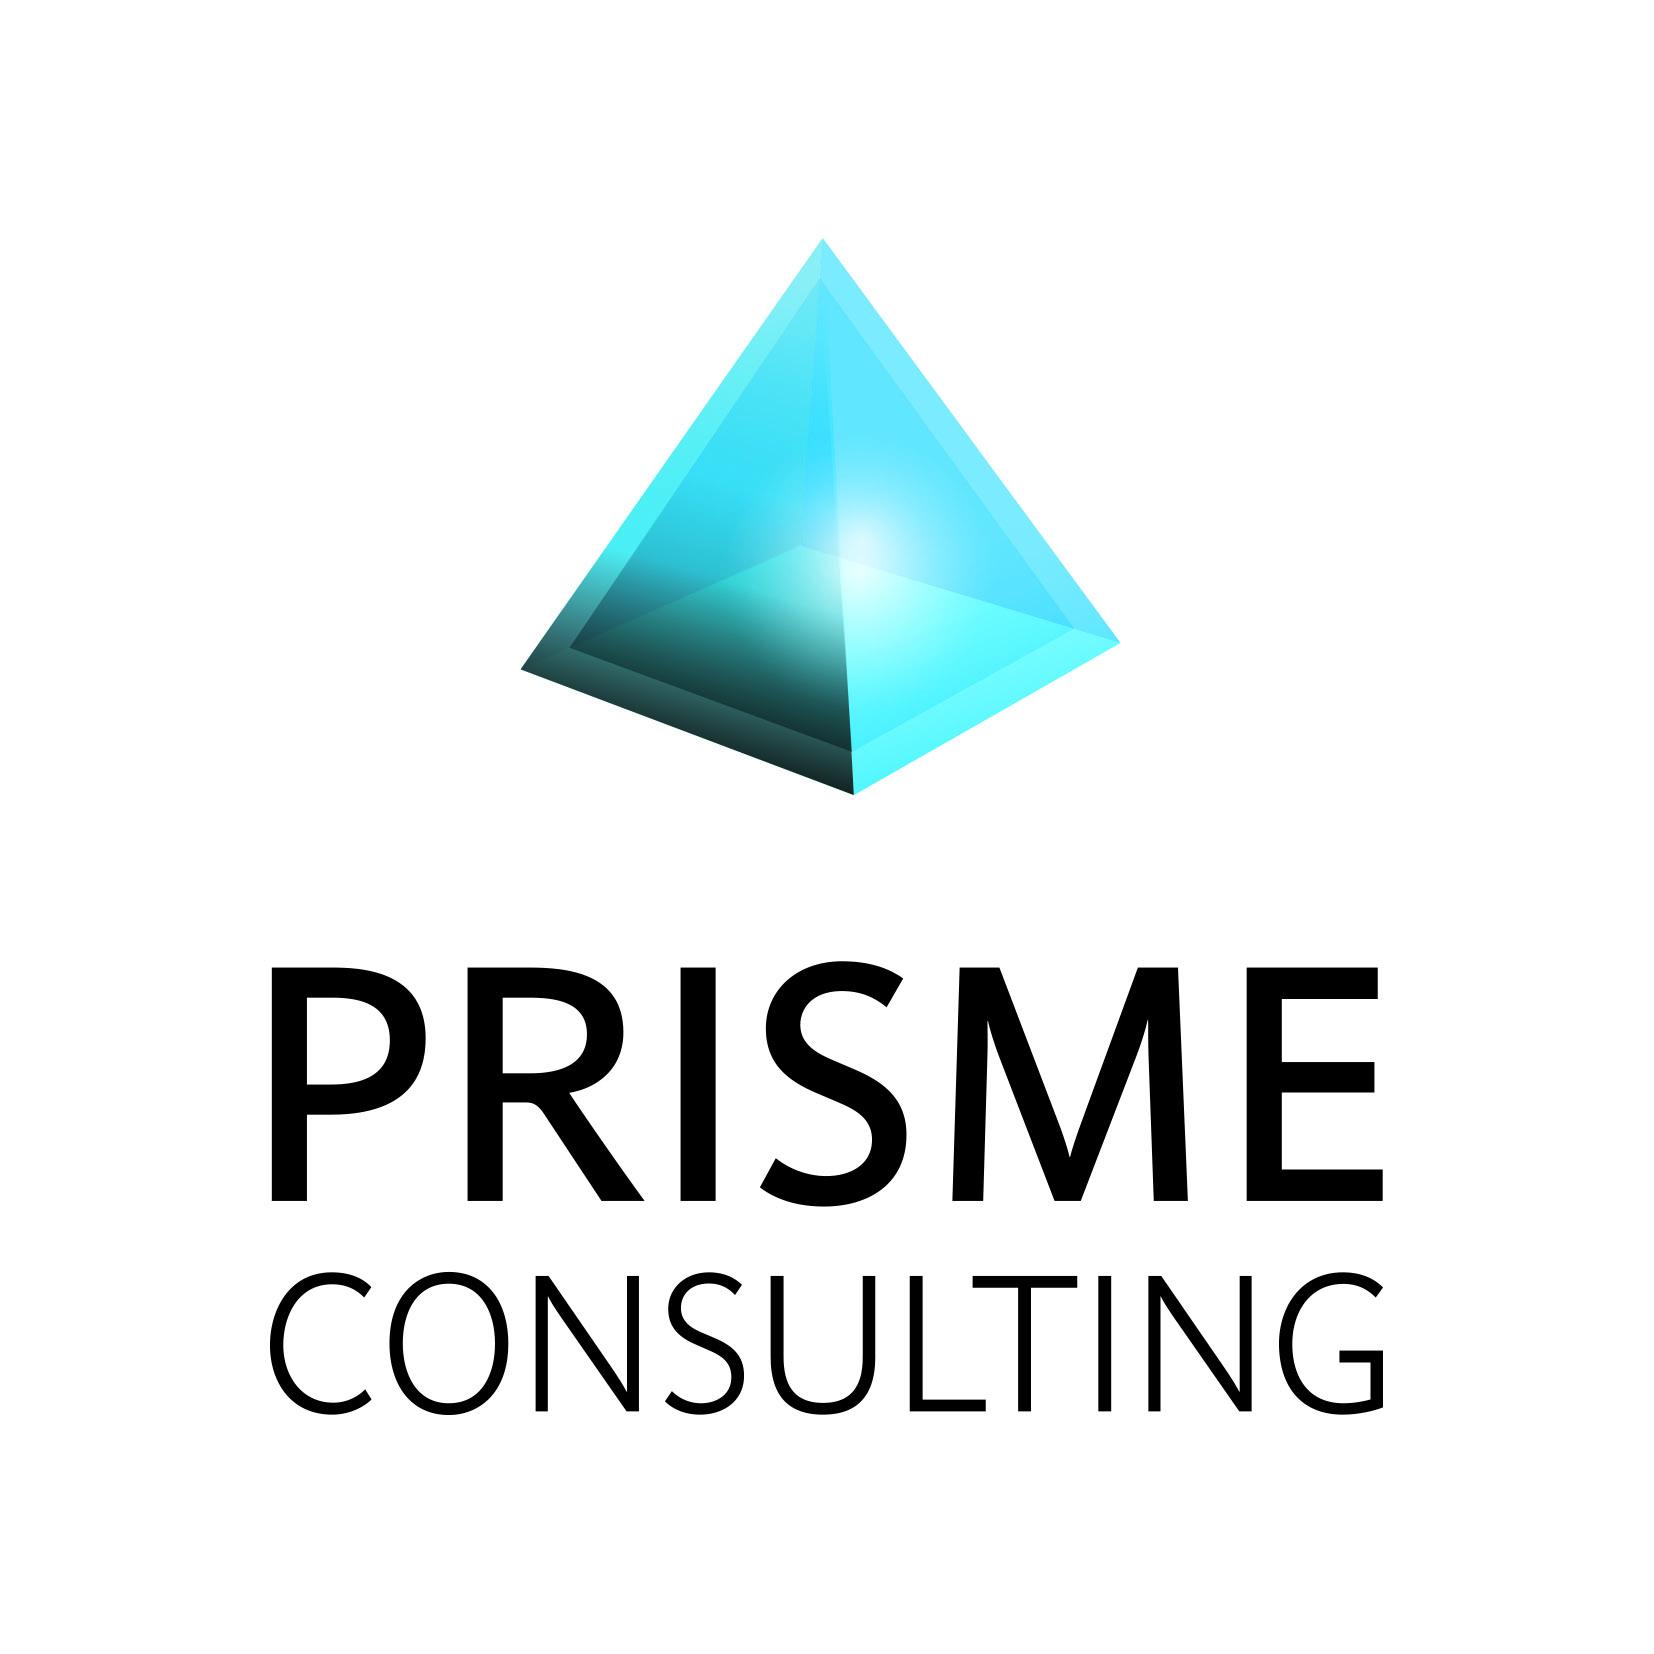 Prisme Consulting